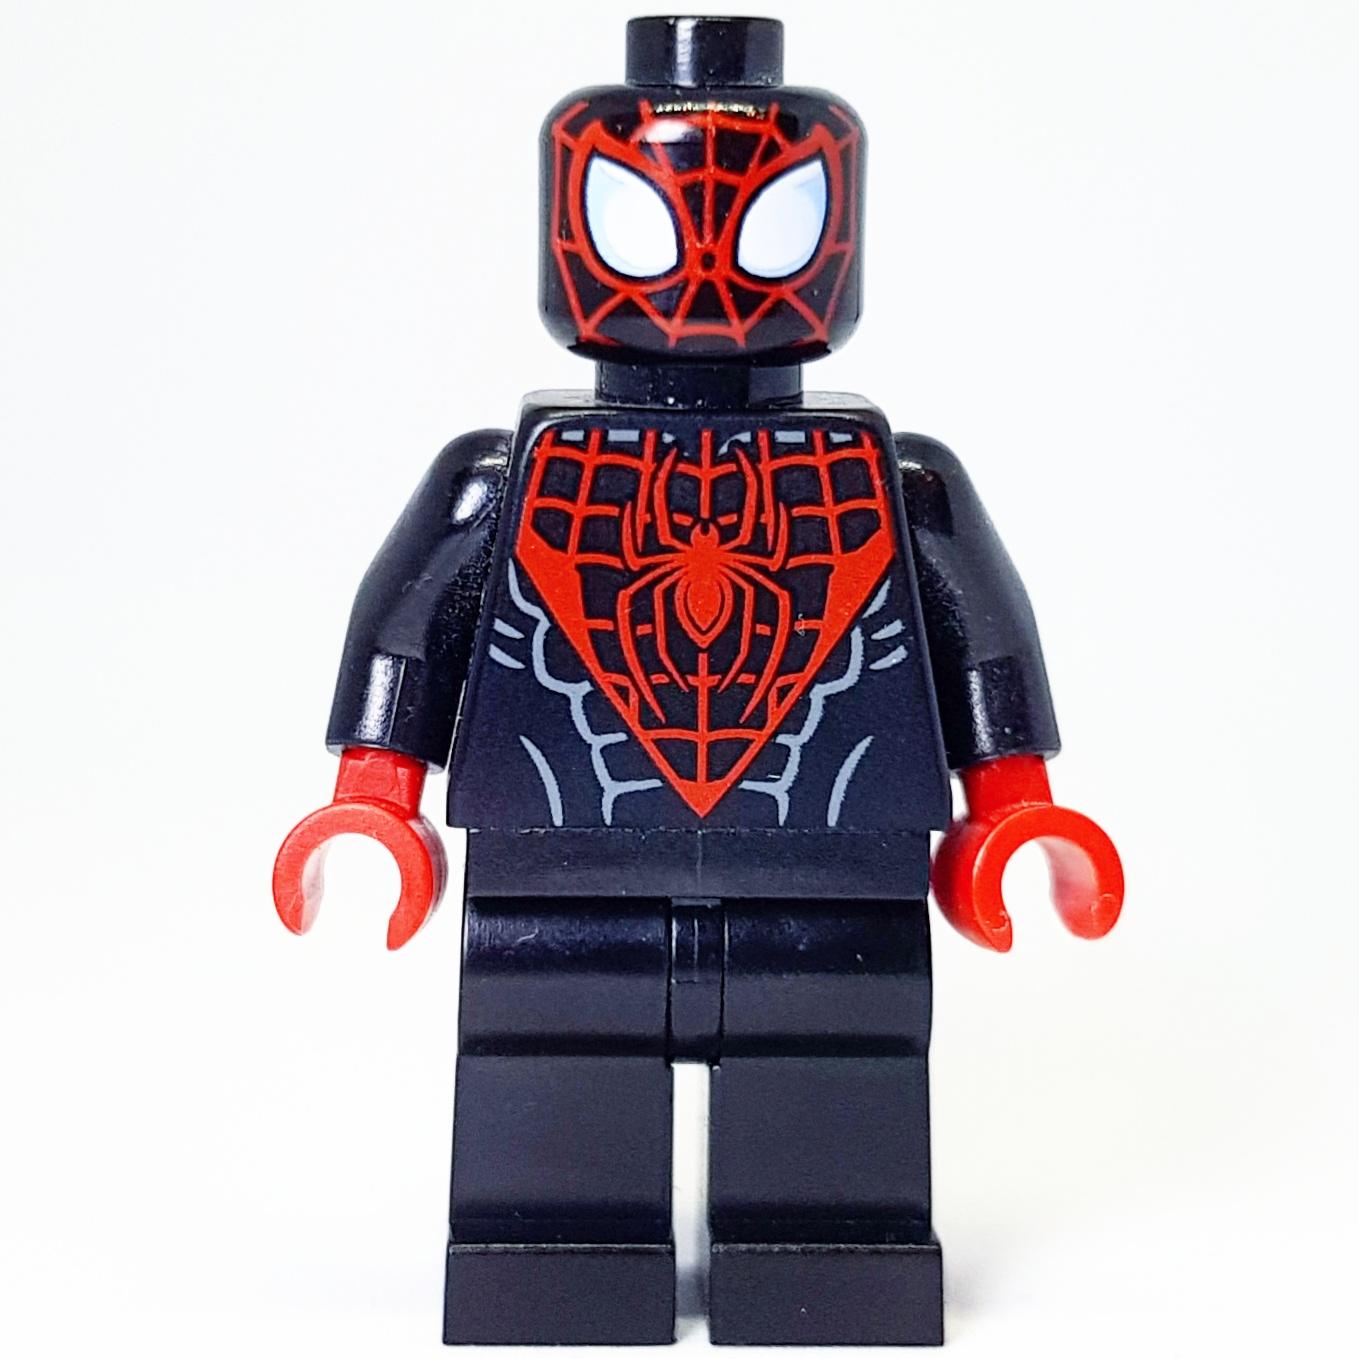 Spider Man Peter Parker In The Lego Incredibles Videogame: Lego Marvel Ultimate Spiderman